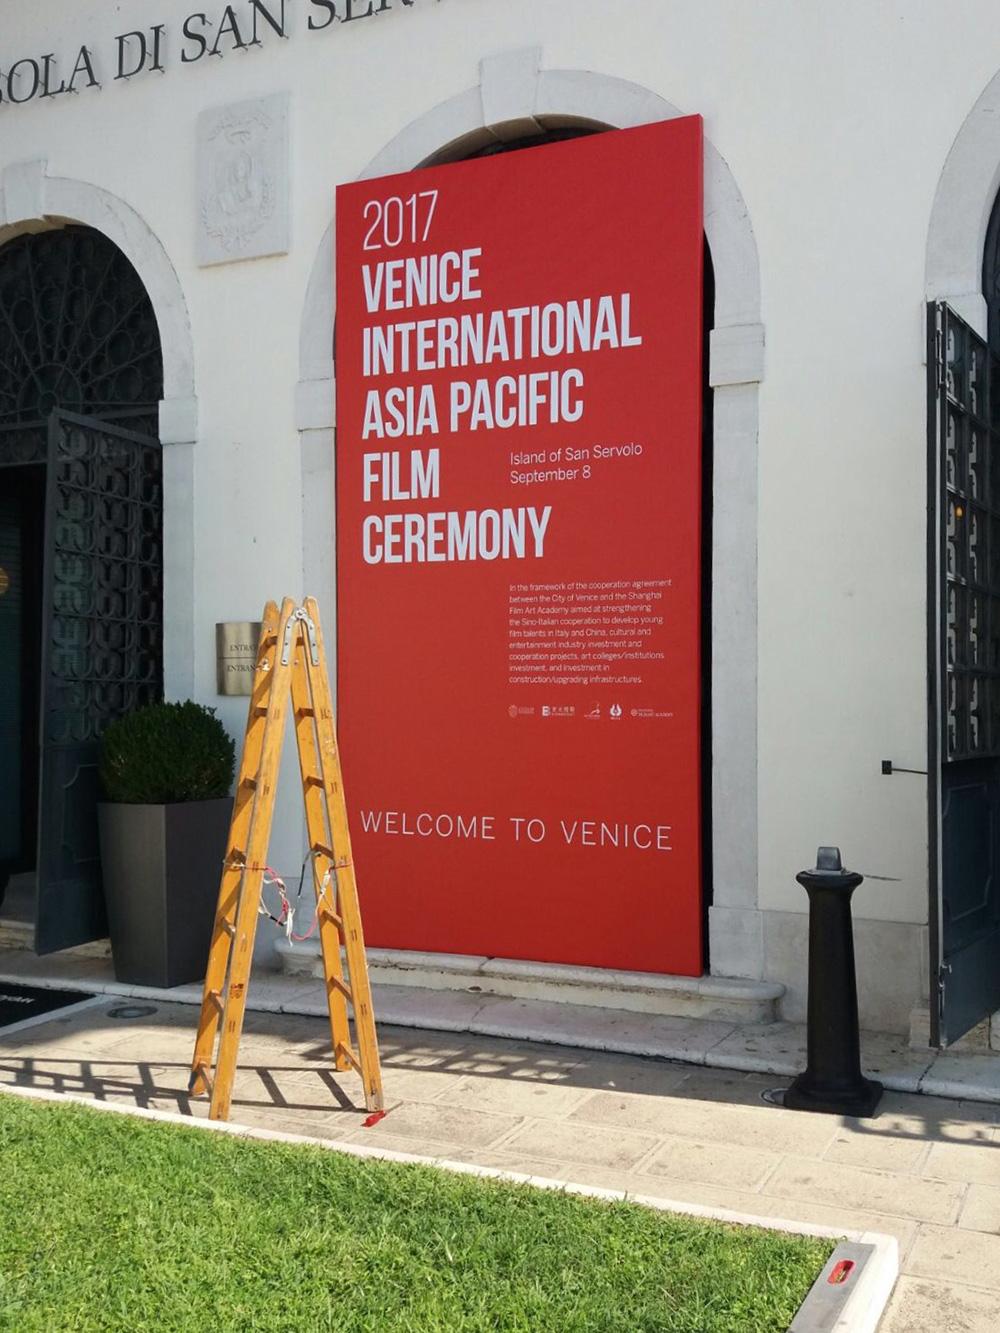 venice internatinal asia pacific film ceremony